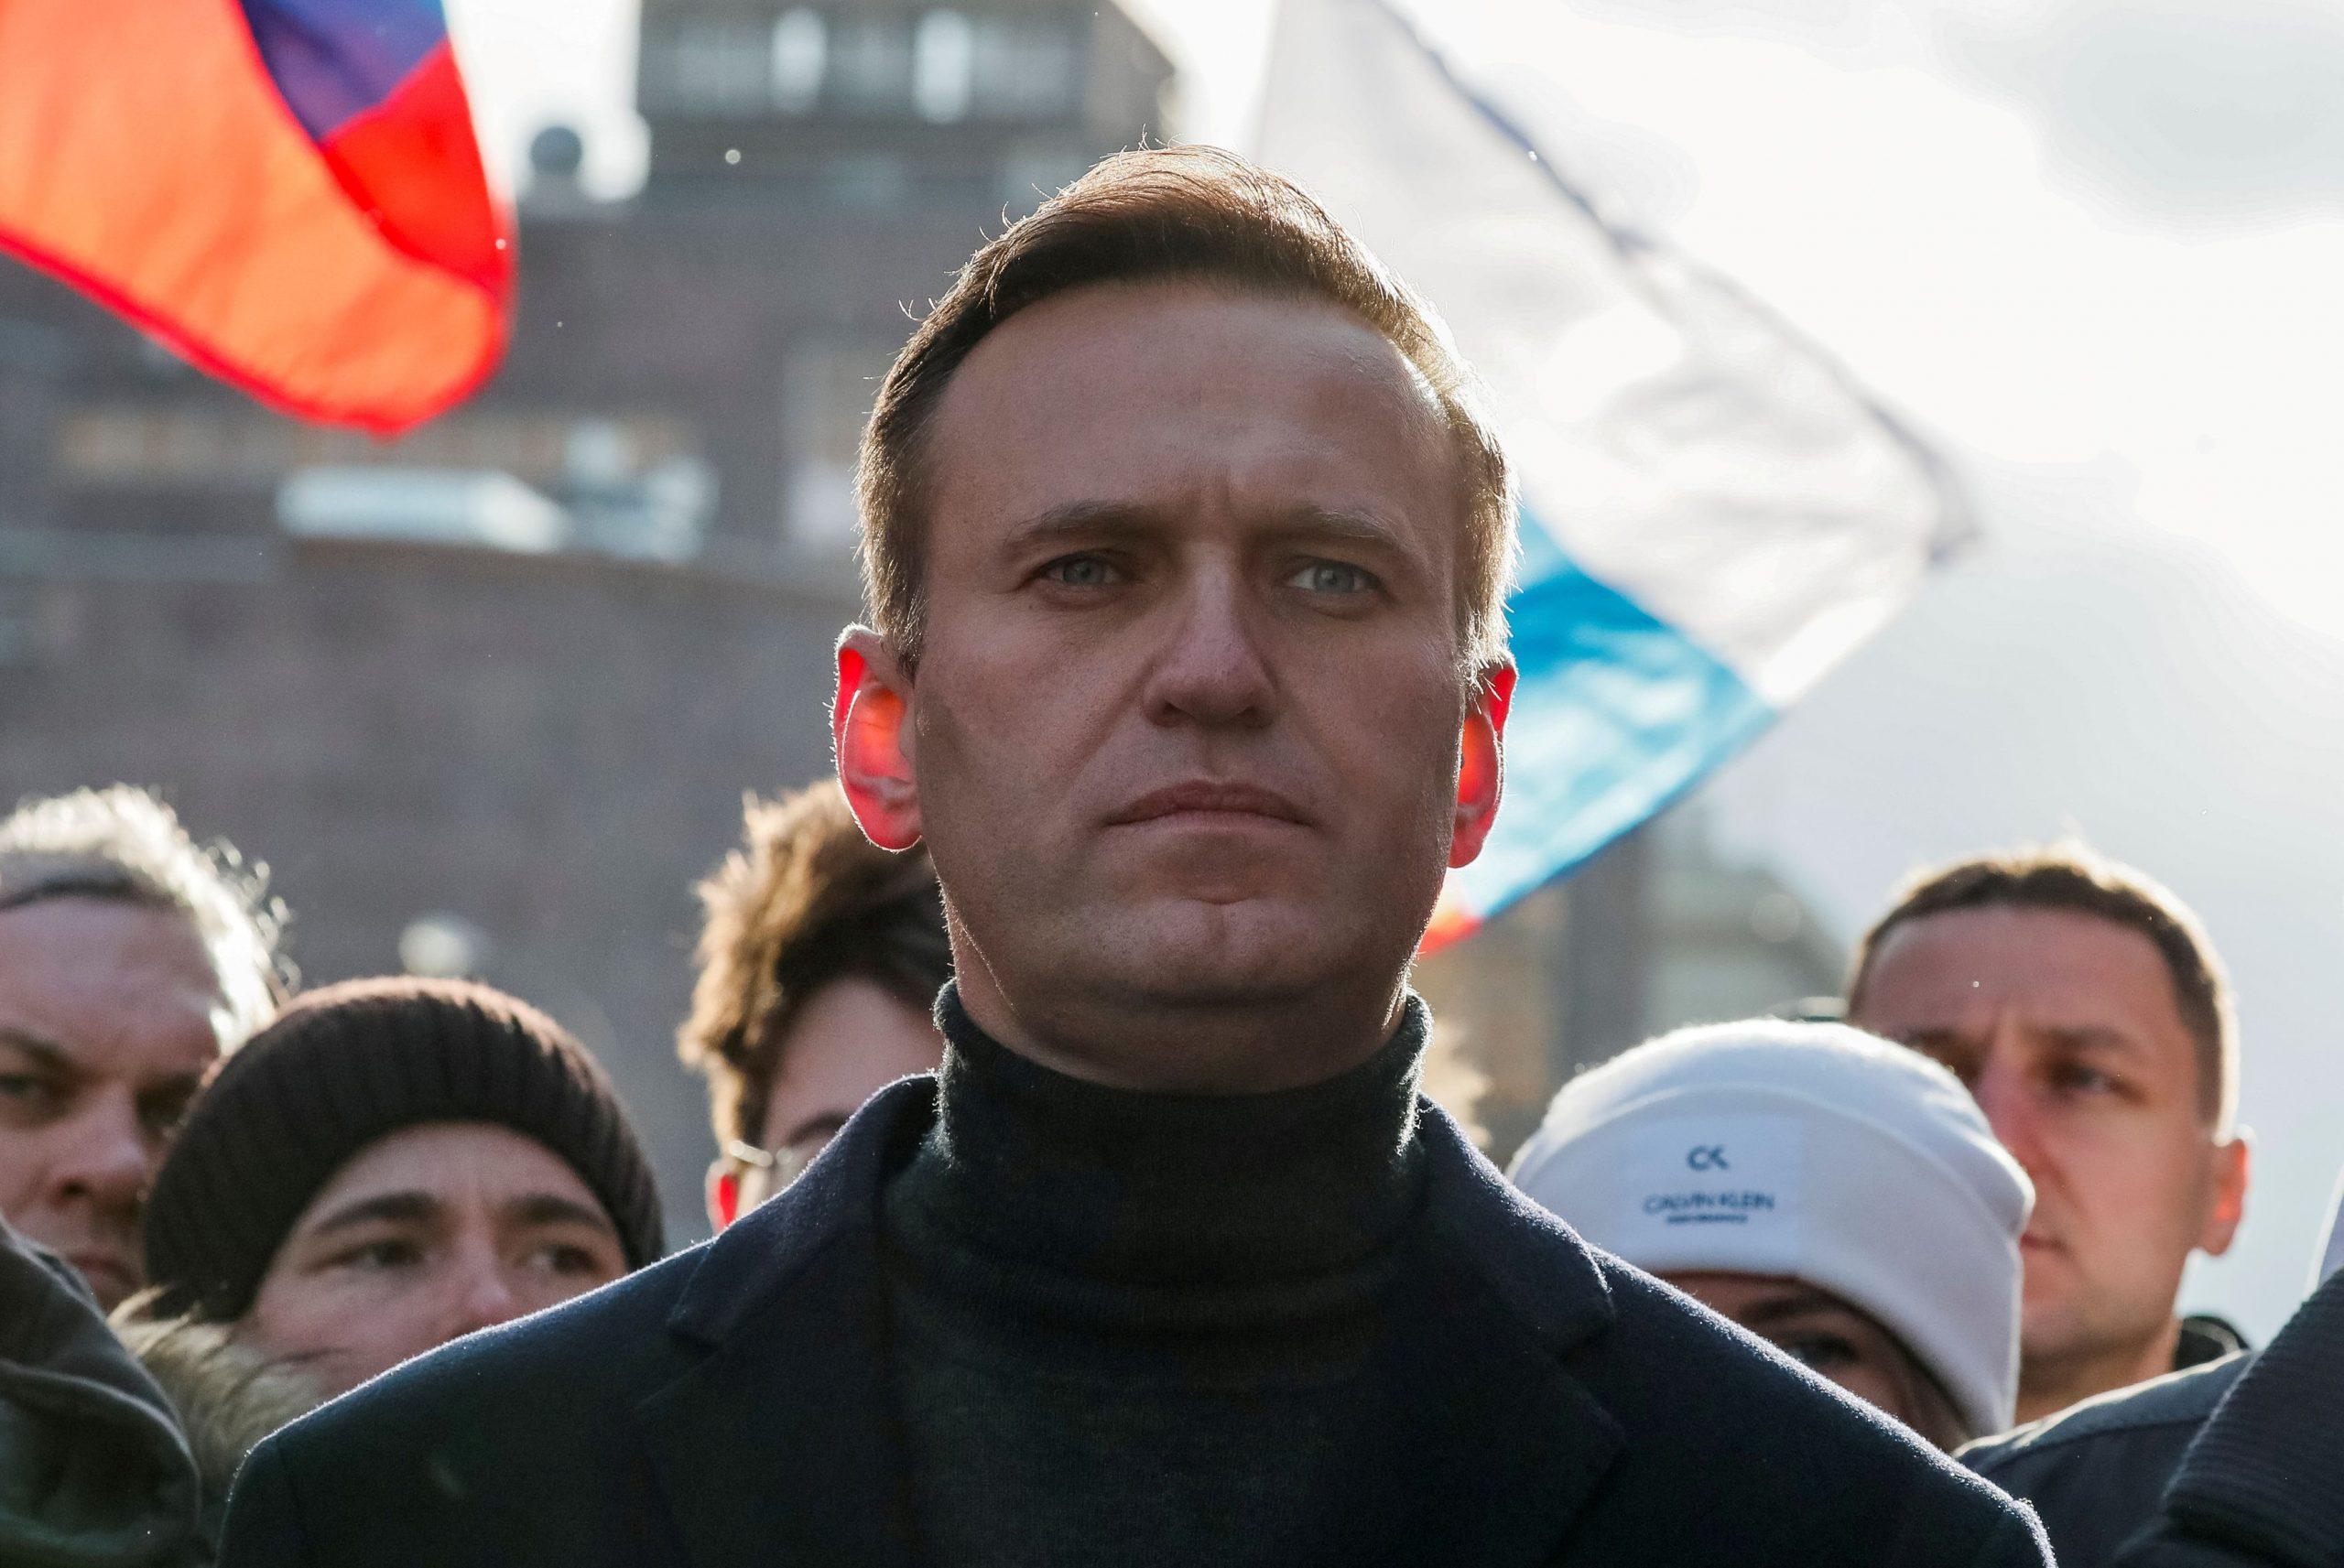 foto: REUTERS/Shamil Zhumatov